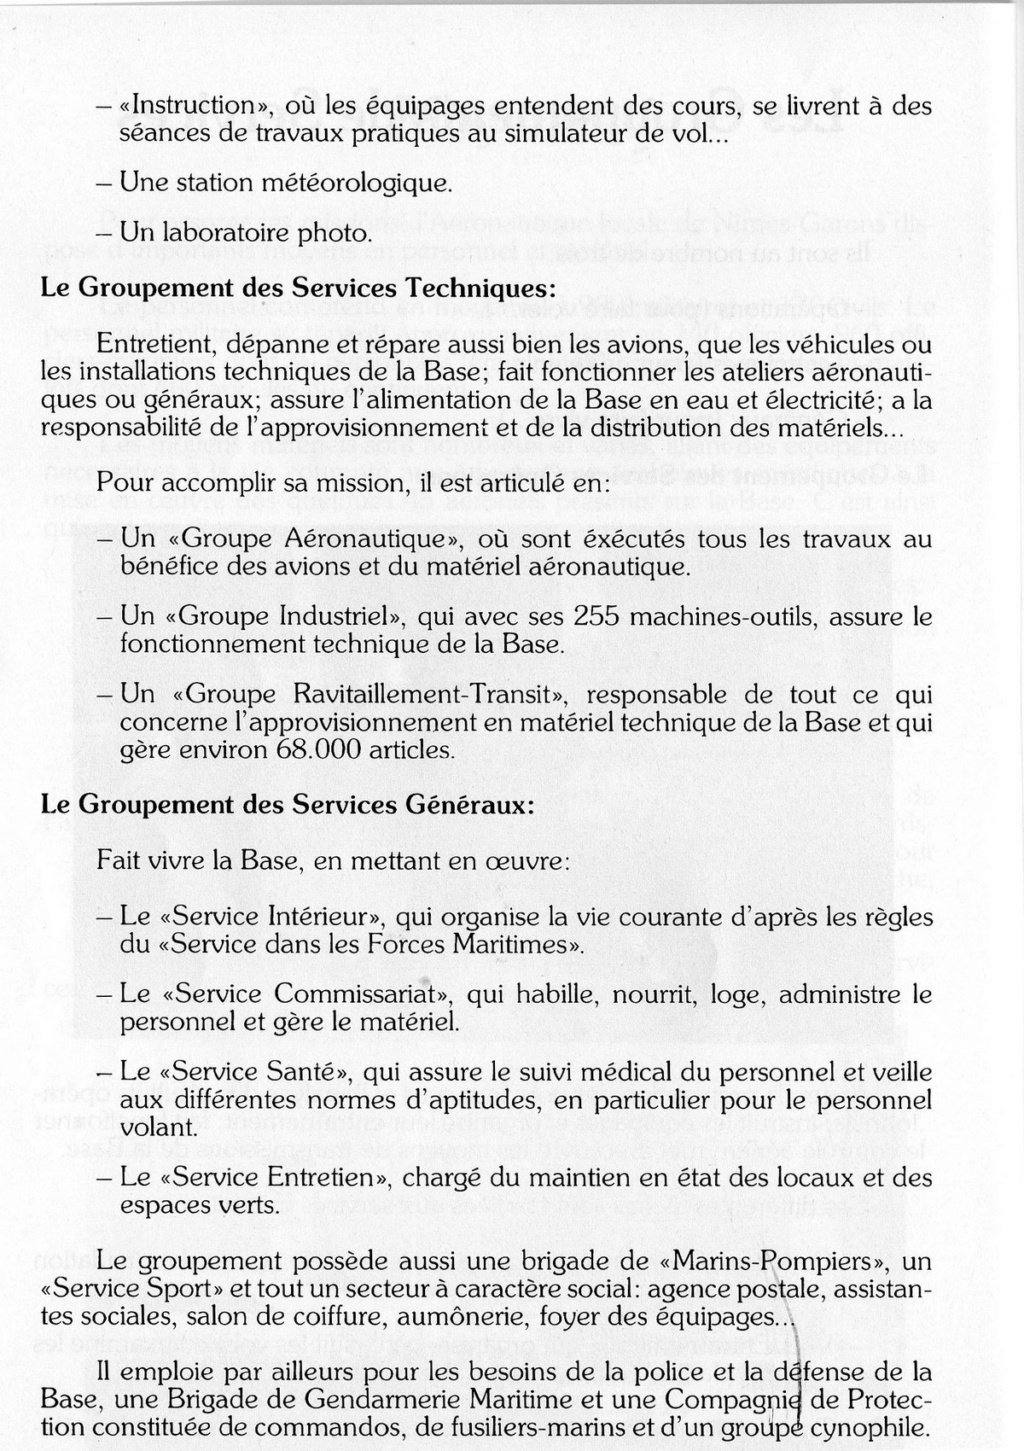 [LES B.A.N.] NÎMES GARONS - Page 4 Img66810